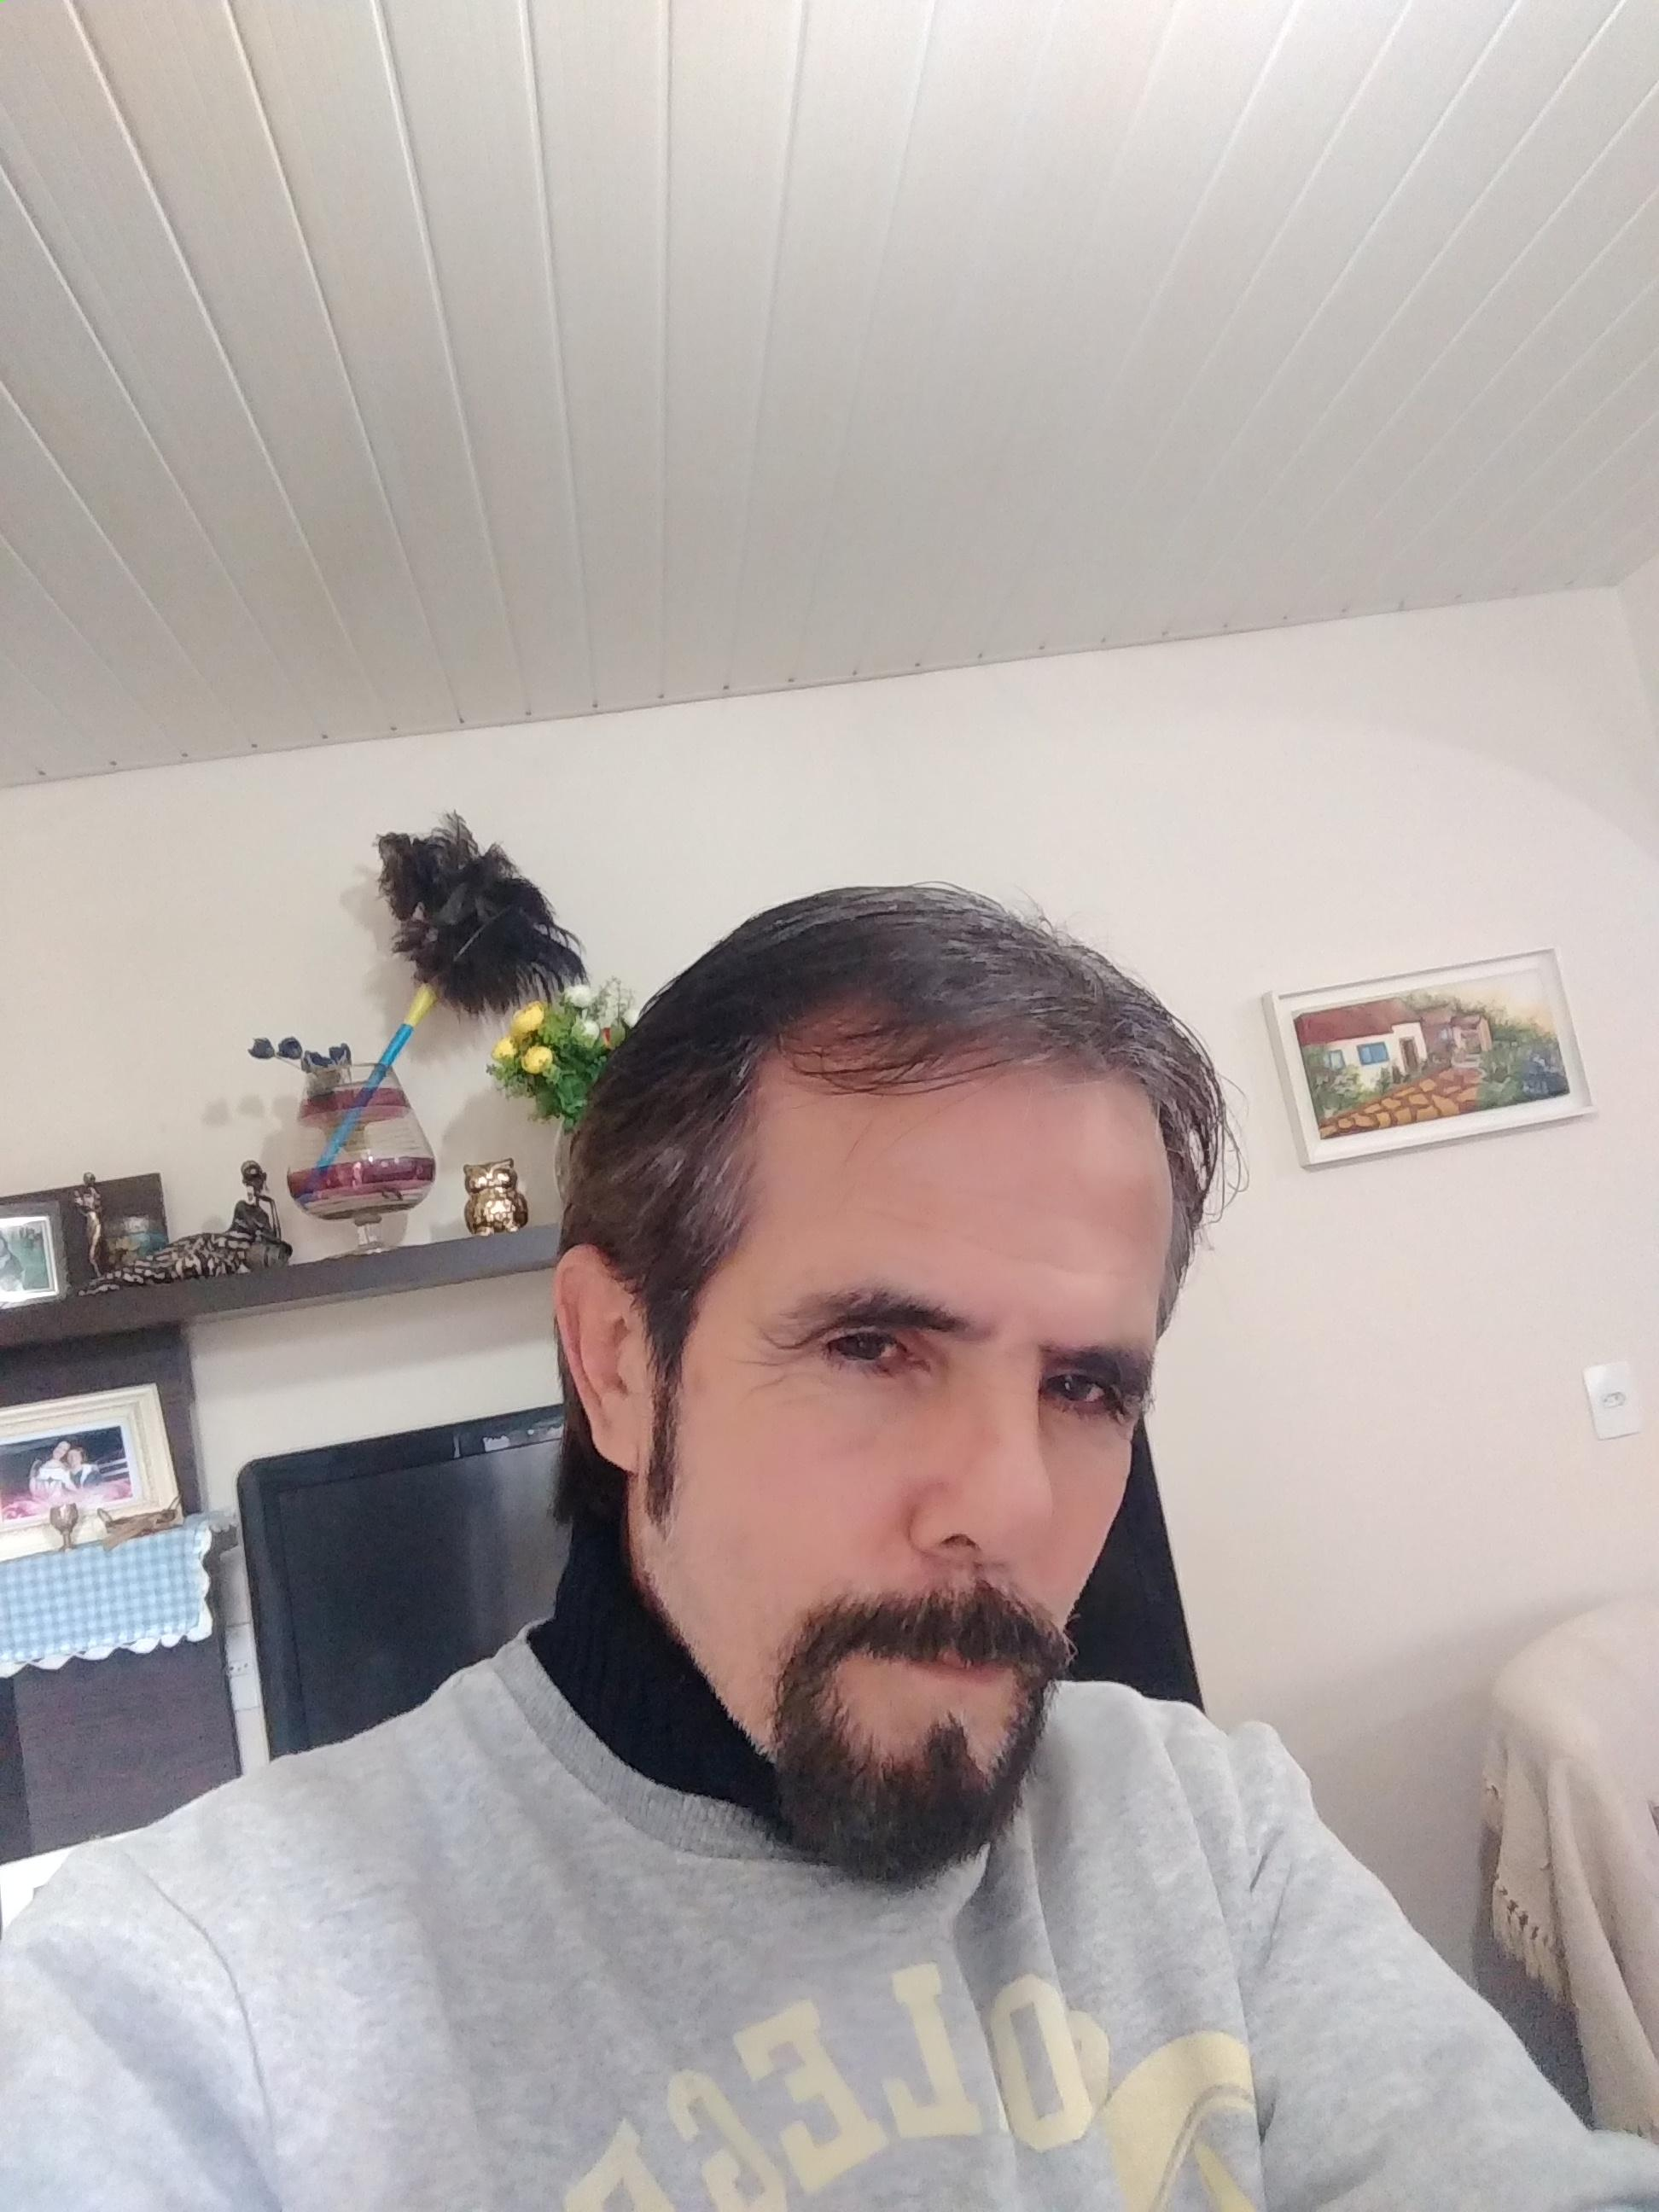 Ricardolobosc1?s=xgcandrszsp5qb7+jbtd7xtruybjkufmvdbnwqh9kxe=